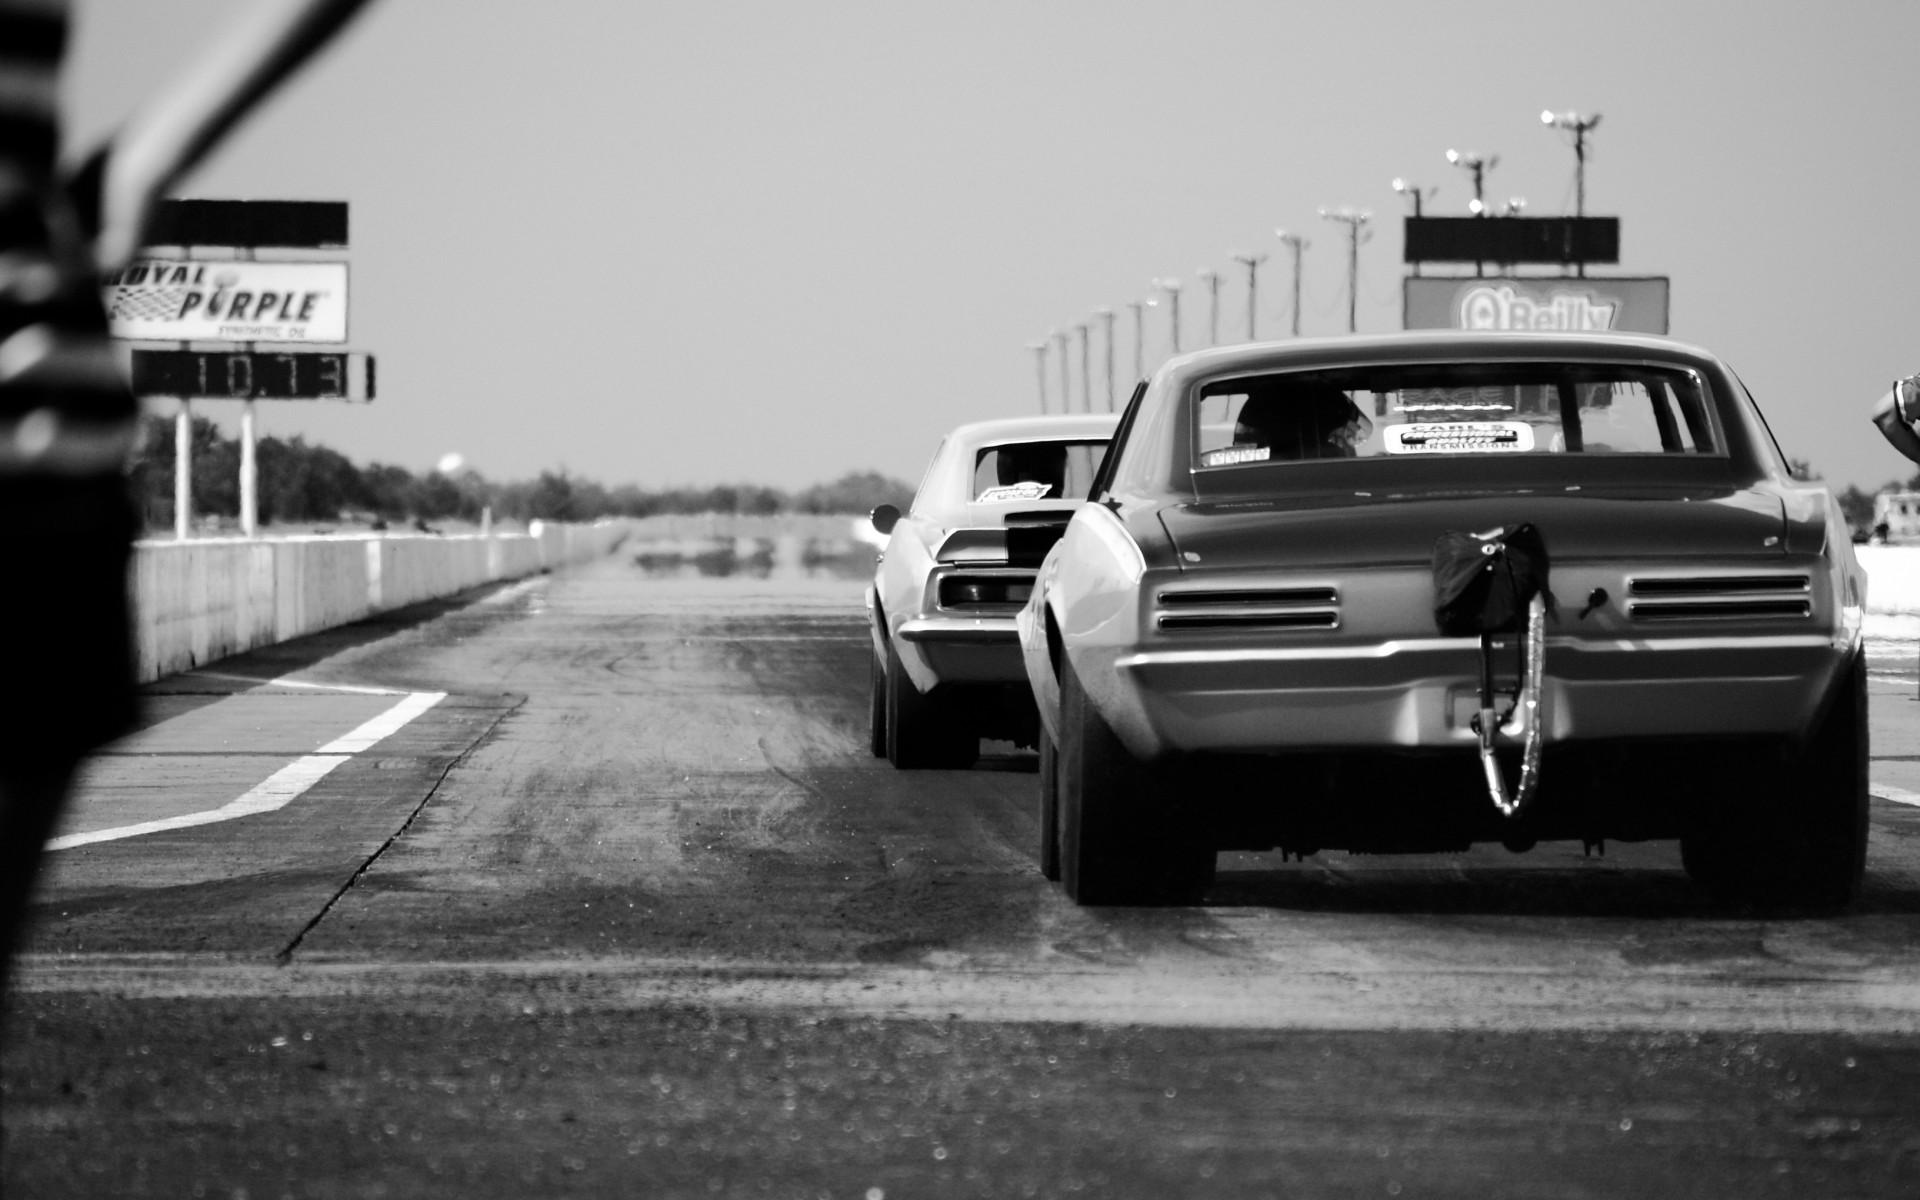 Res: 1920x1200, Vehicles - Drag Racing Drag Race Race Car Wallpaper